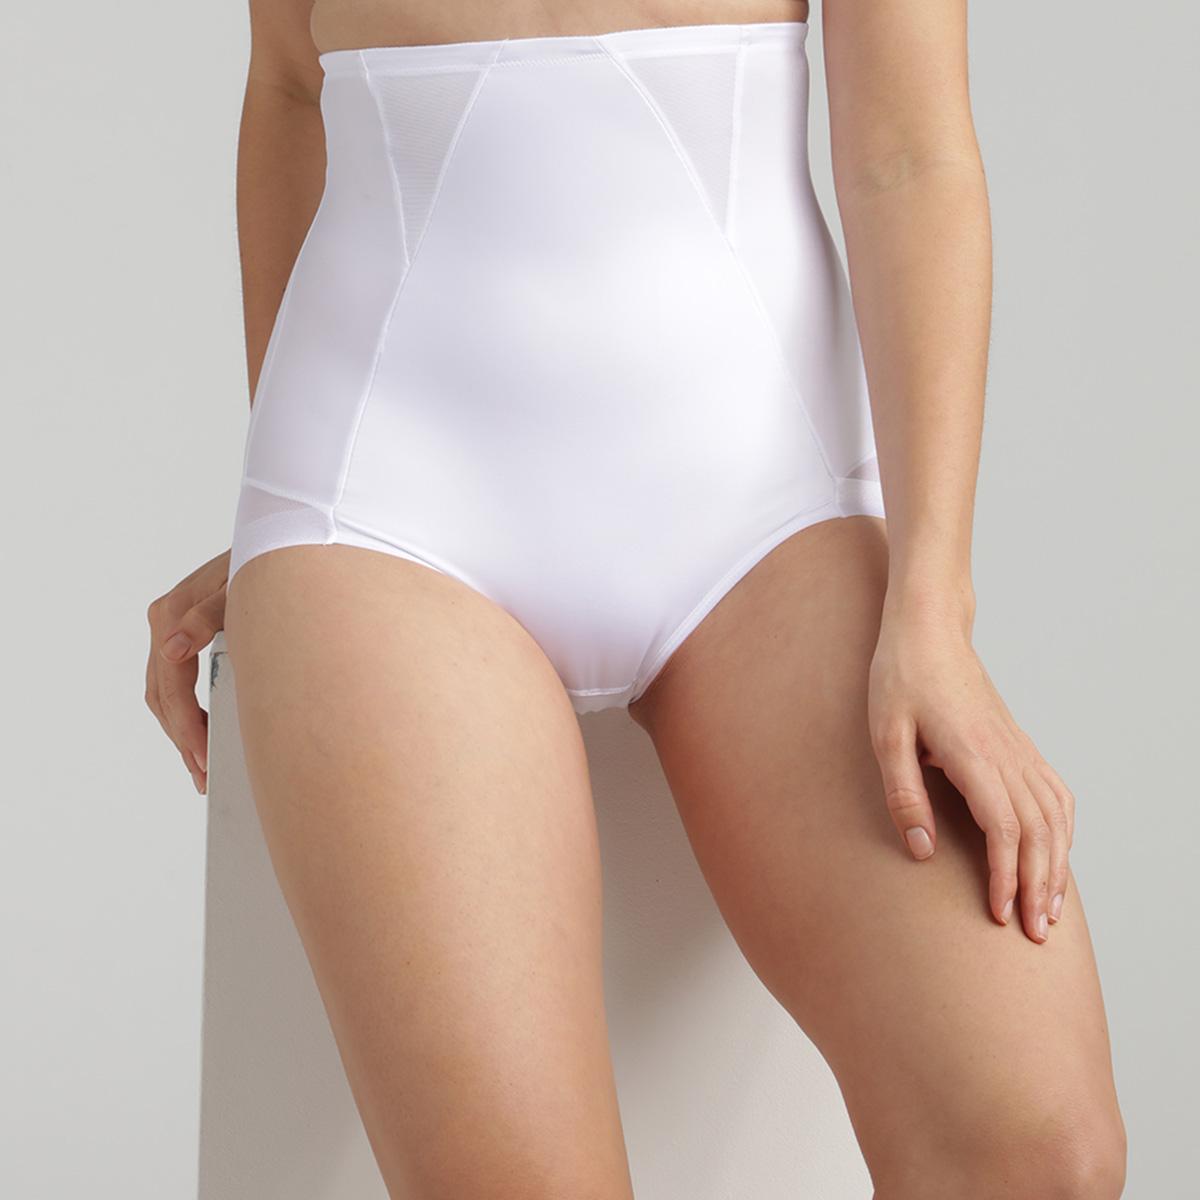 Faja corpiño blanca - Perfect Silhouette, , PLAYTEX